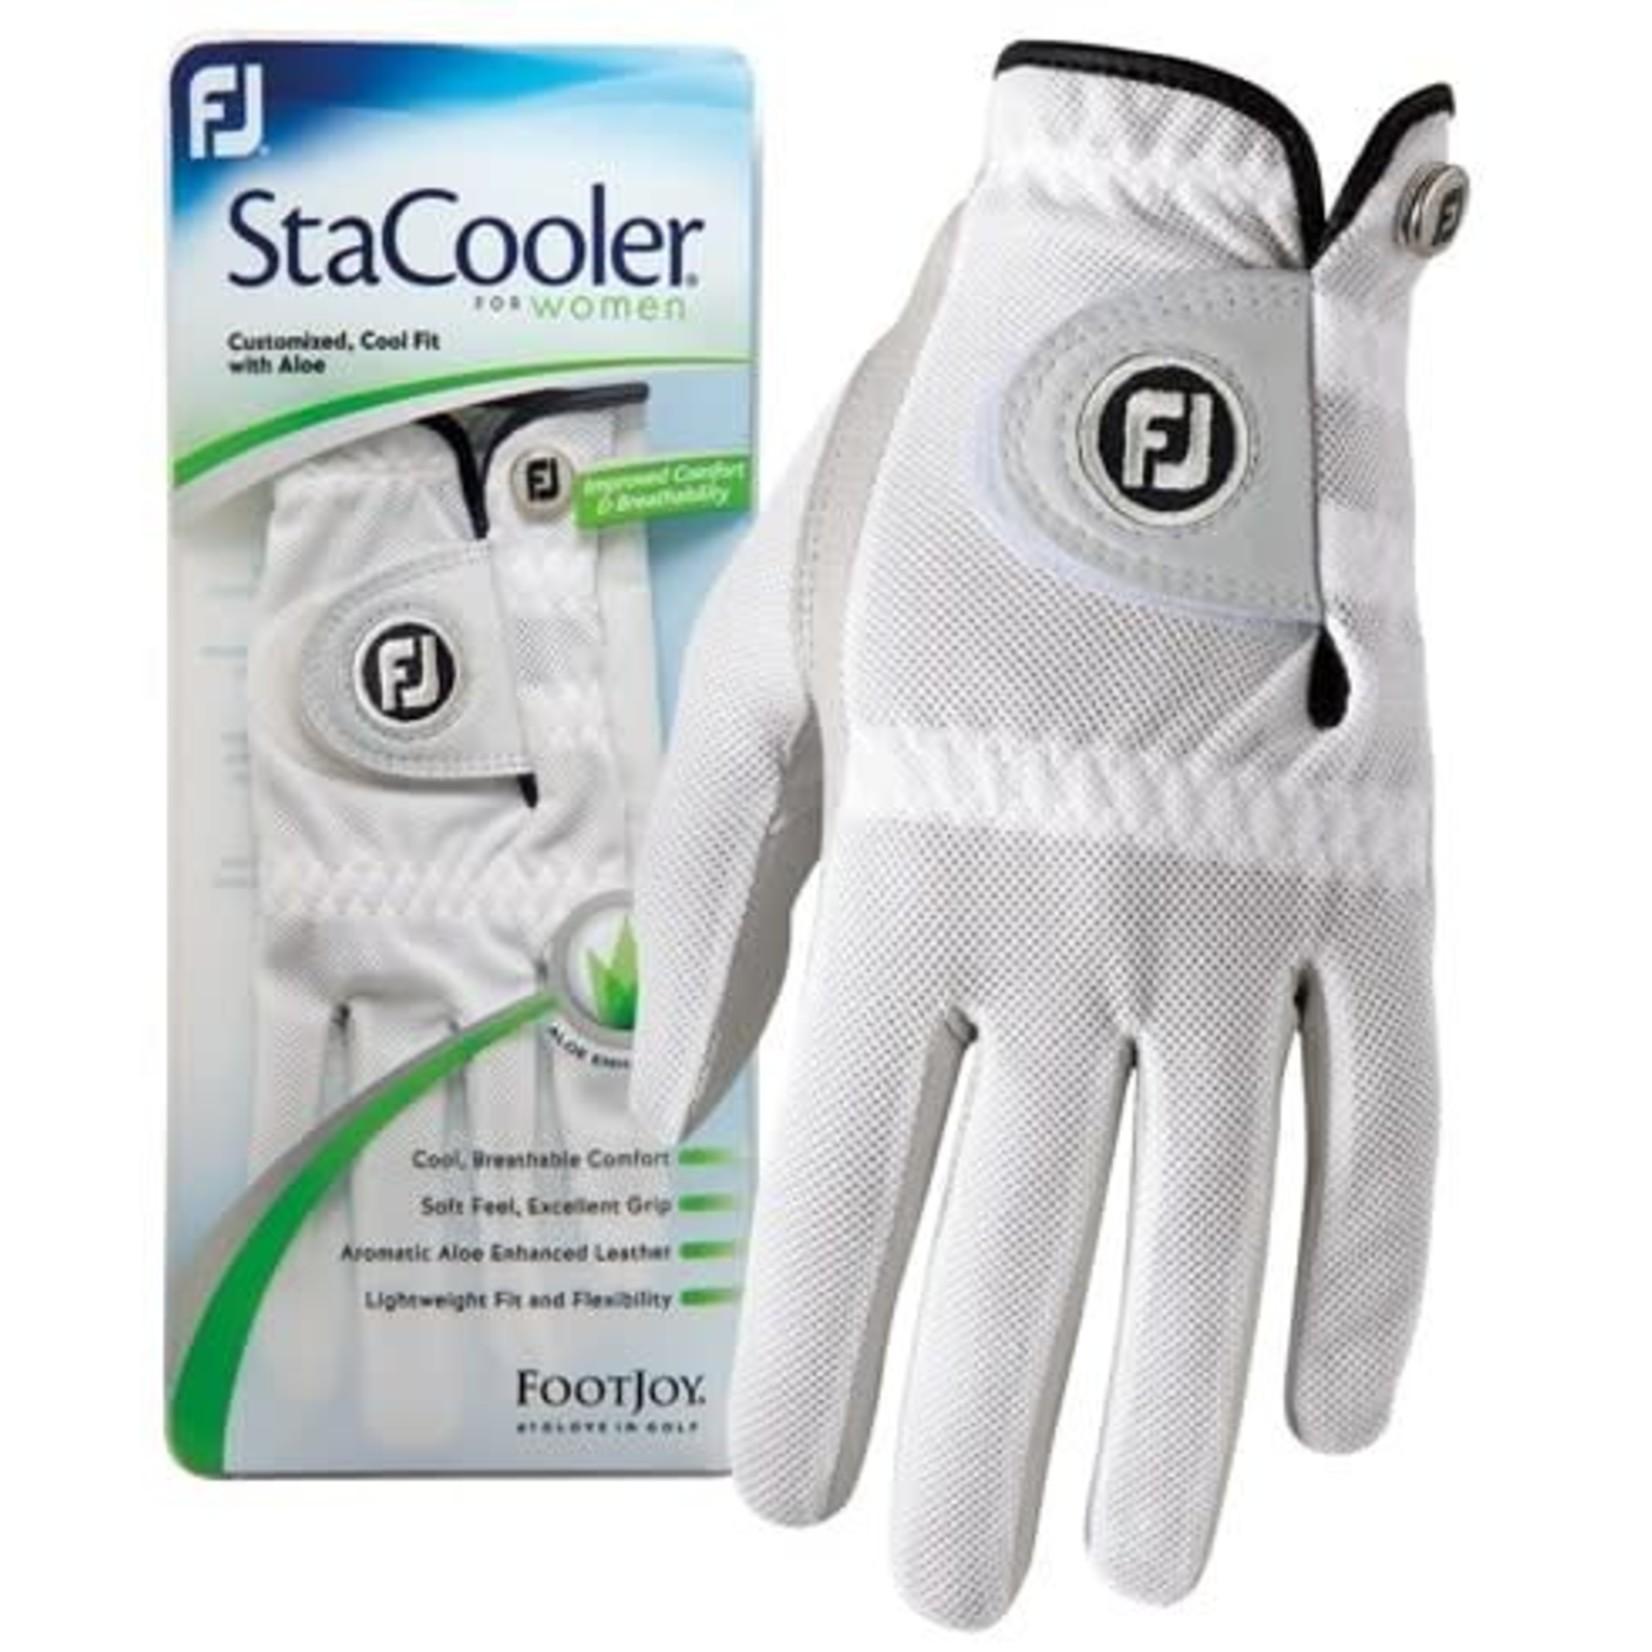 Footjoy FJ StaCooler Wmn's Glove